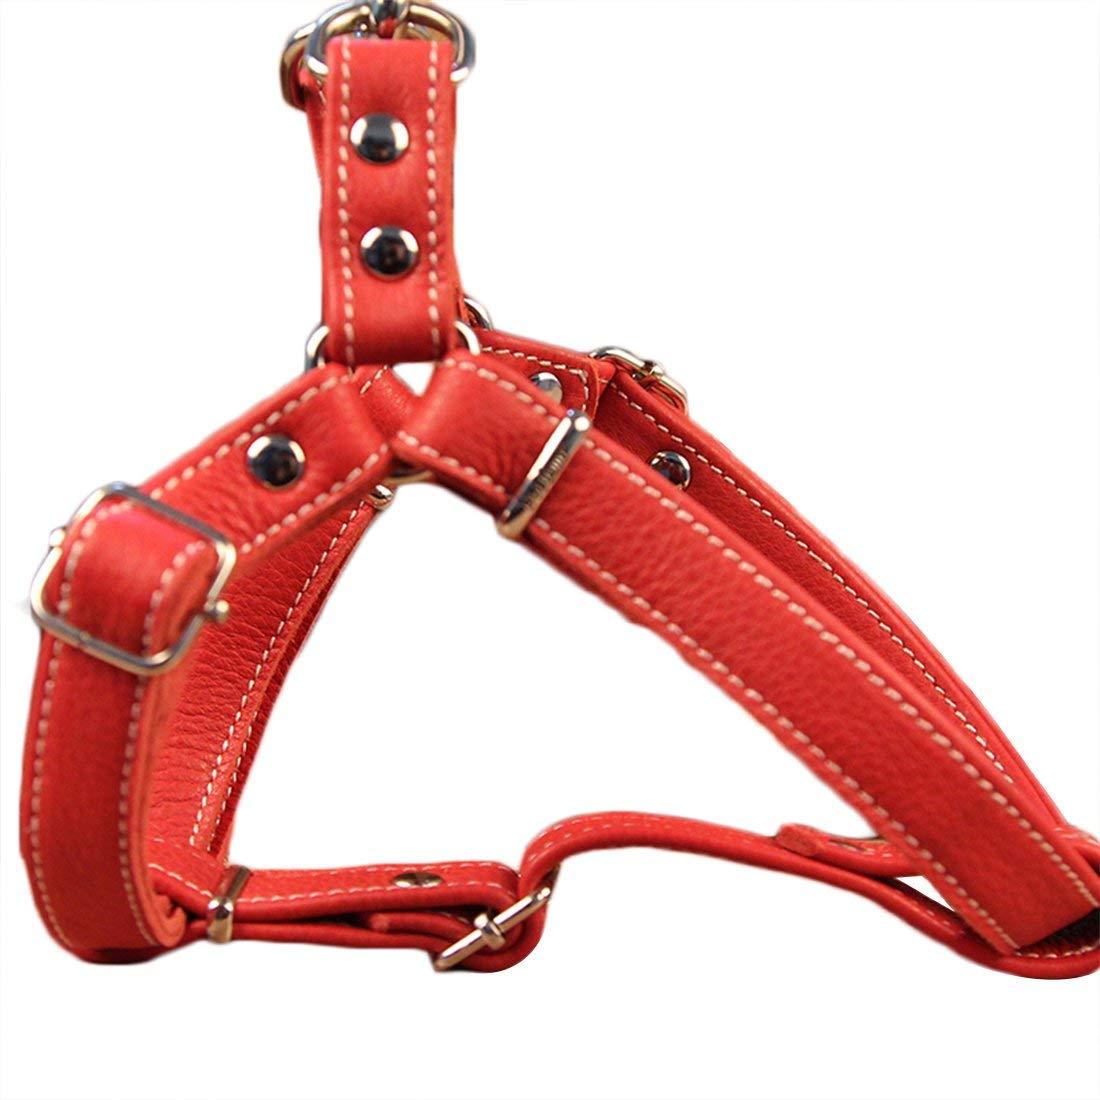 HEI SHOP Dog Harness Anti Pull in Morbida Pelle Gilet Imbracatura Imbracatura Regolabile Norvegese Escape Prova Pet Imbracatura in Pelle Morbida per Cani Taglia Piccola e Media